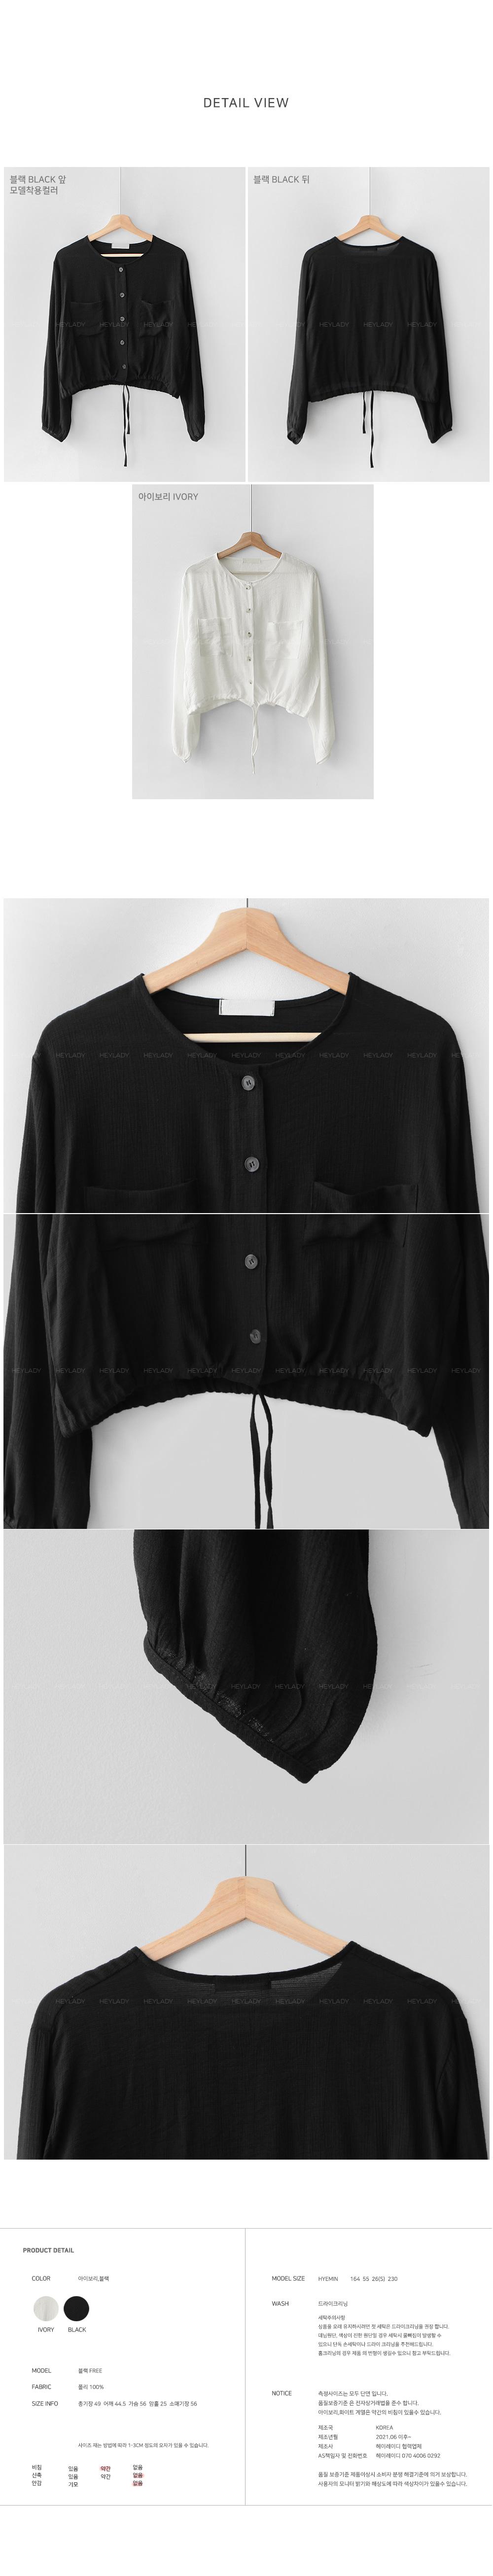 Tonya string blouse